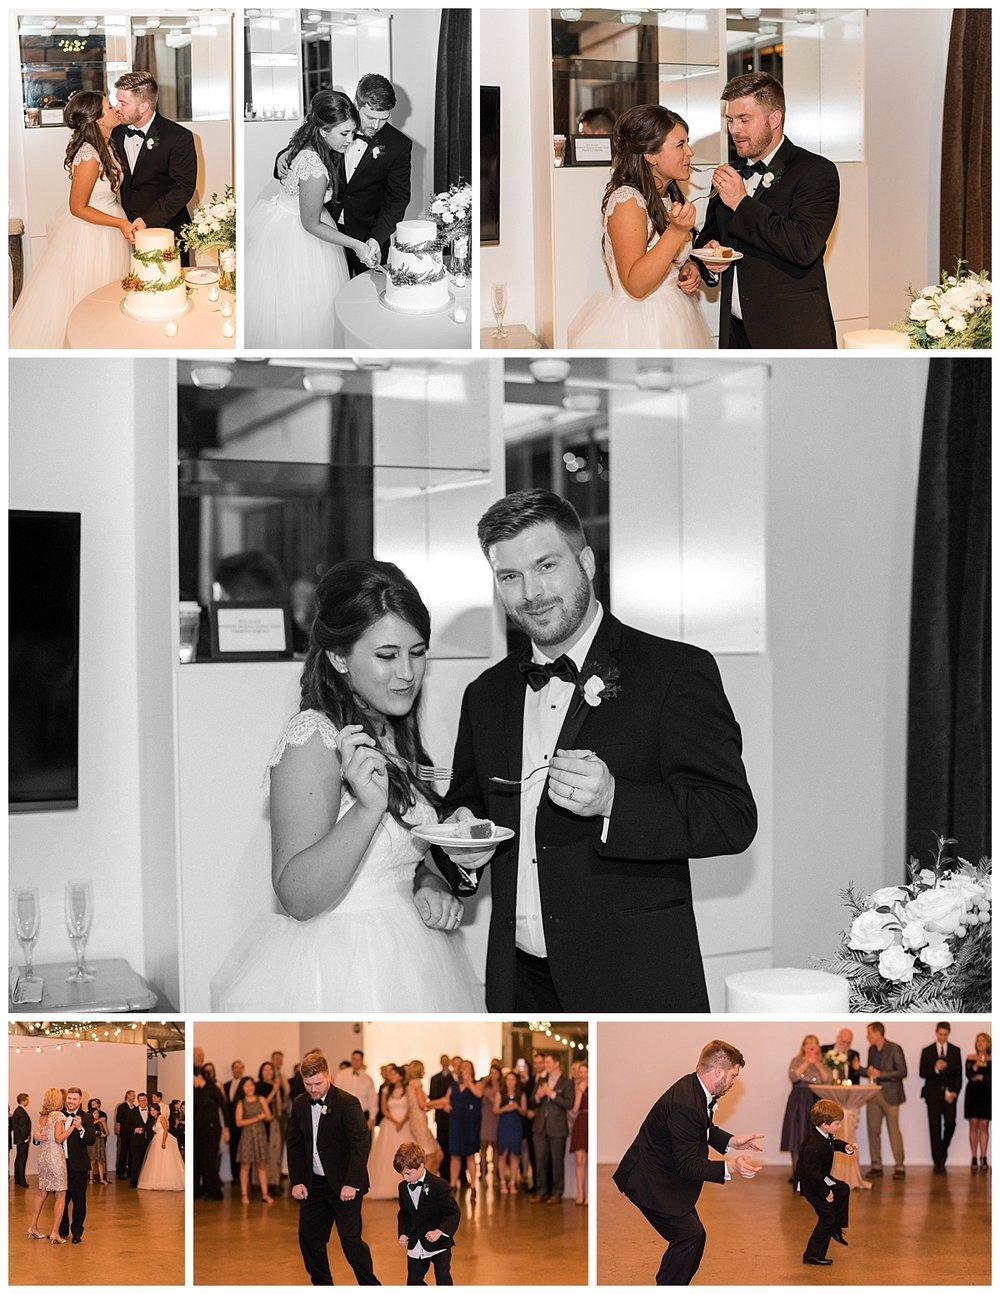 hickory-street-annex-wedding-ar-photography-15.jpg